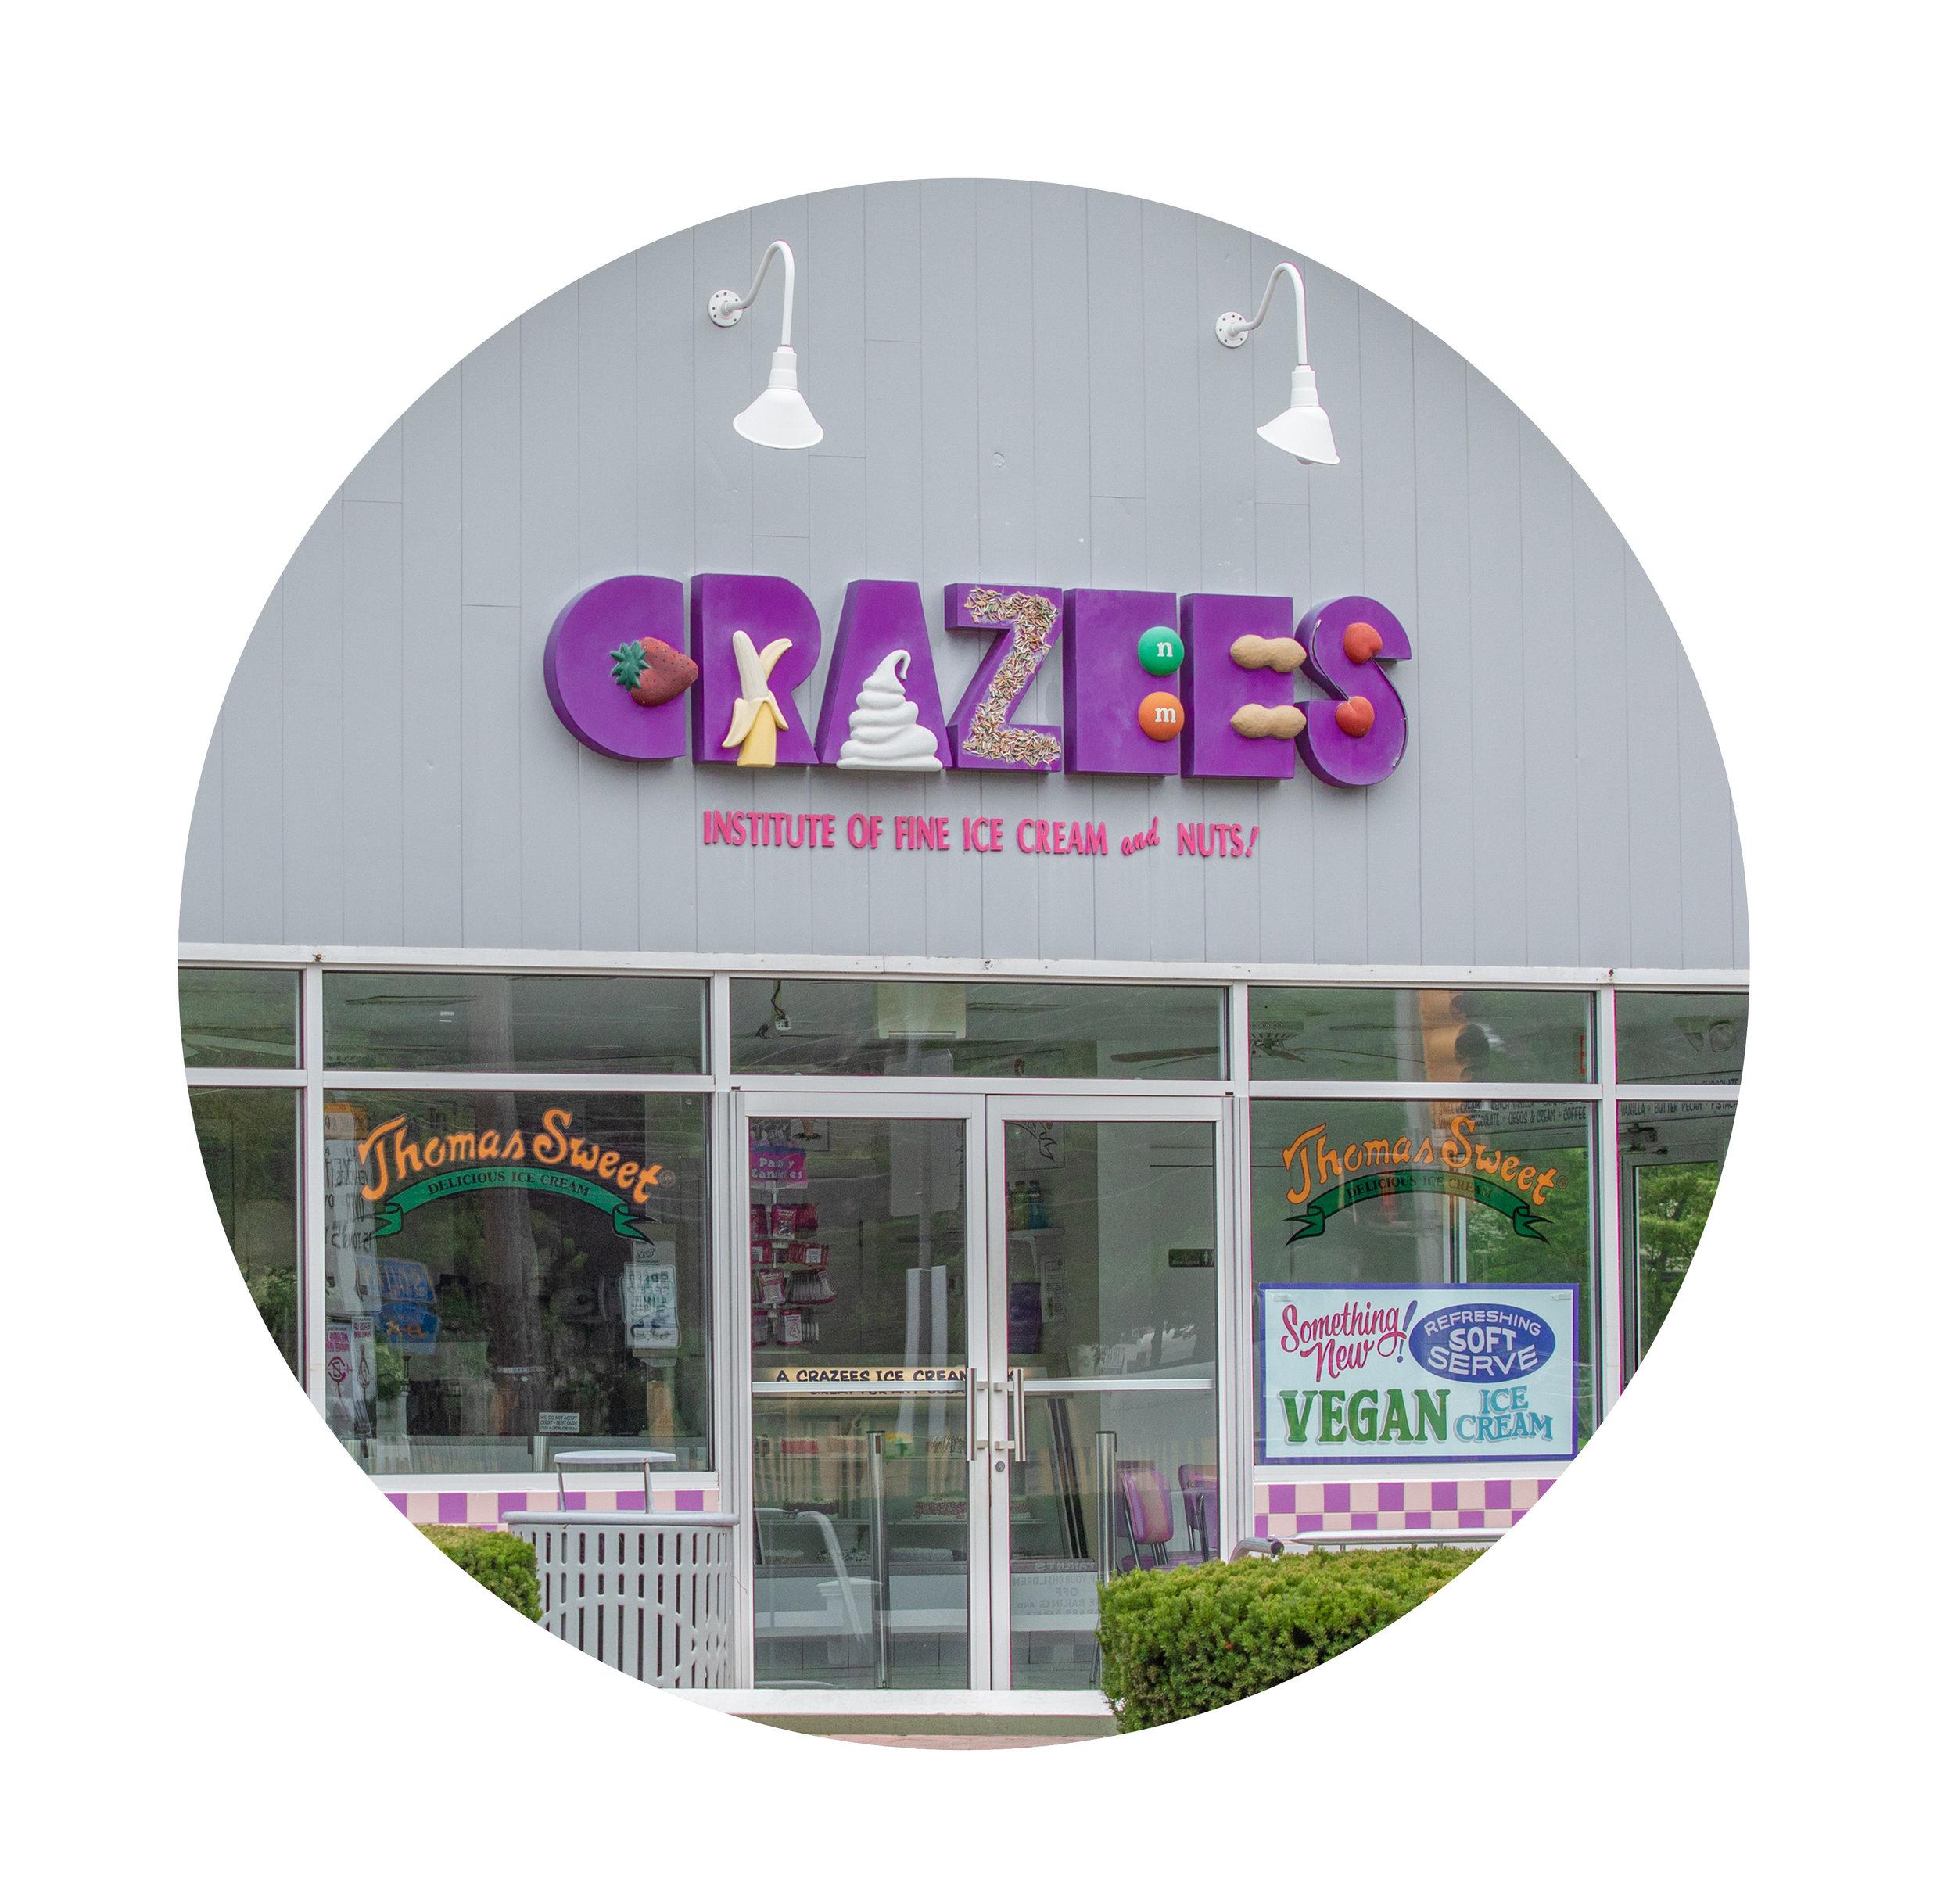 crazees-shop-exterior-circle-crop.jpg